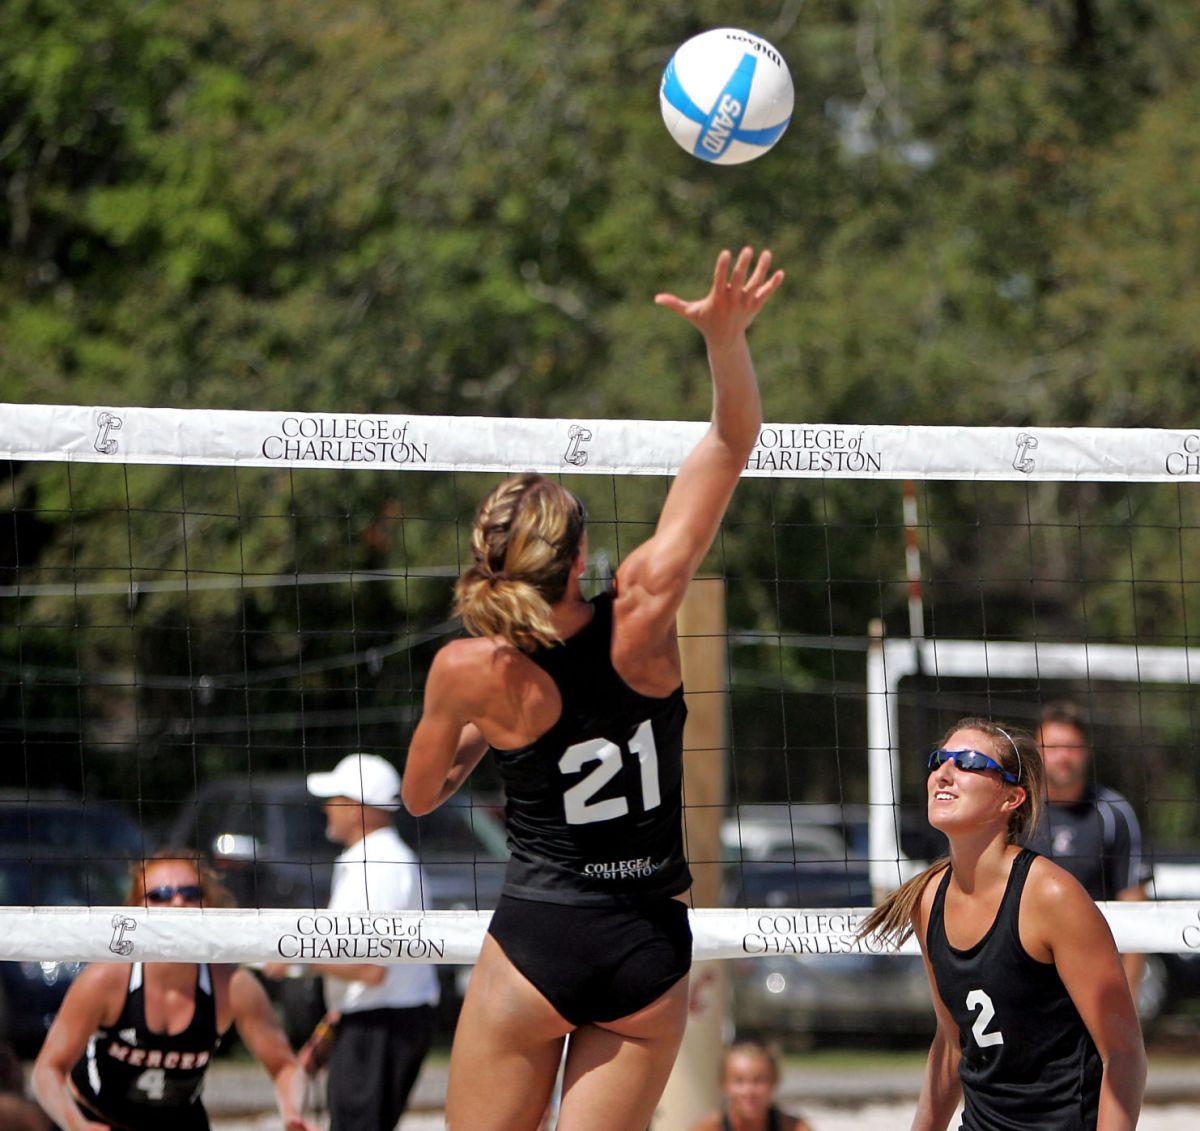 College of Charleston Sand Volleyball